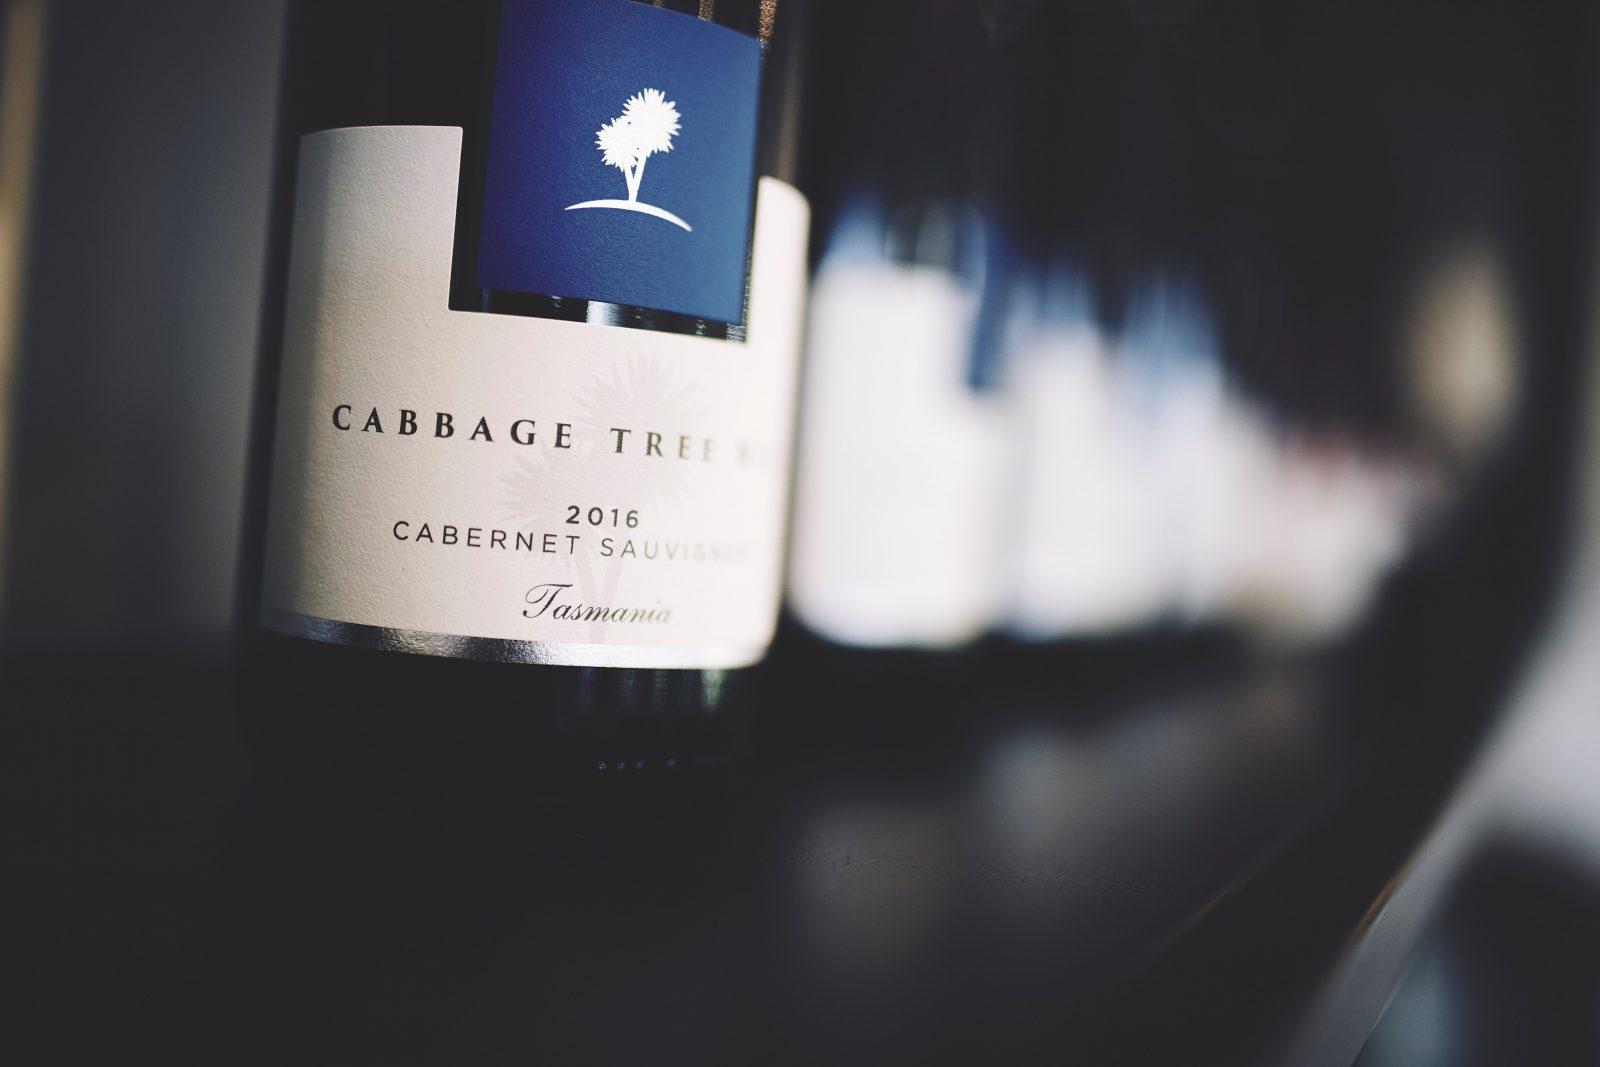 2016 Cabernet Savignon